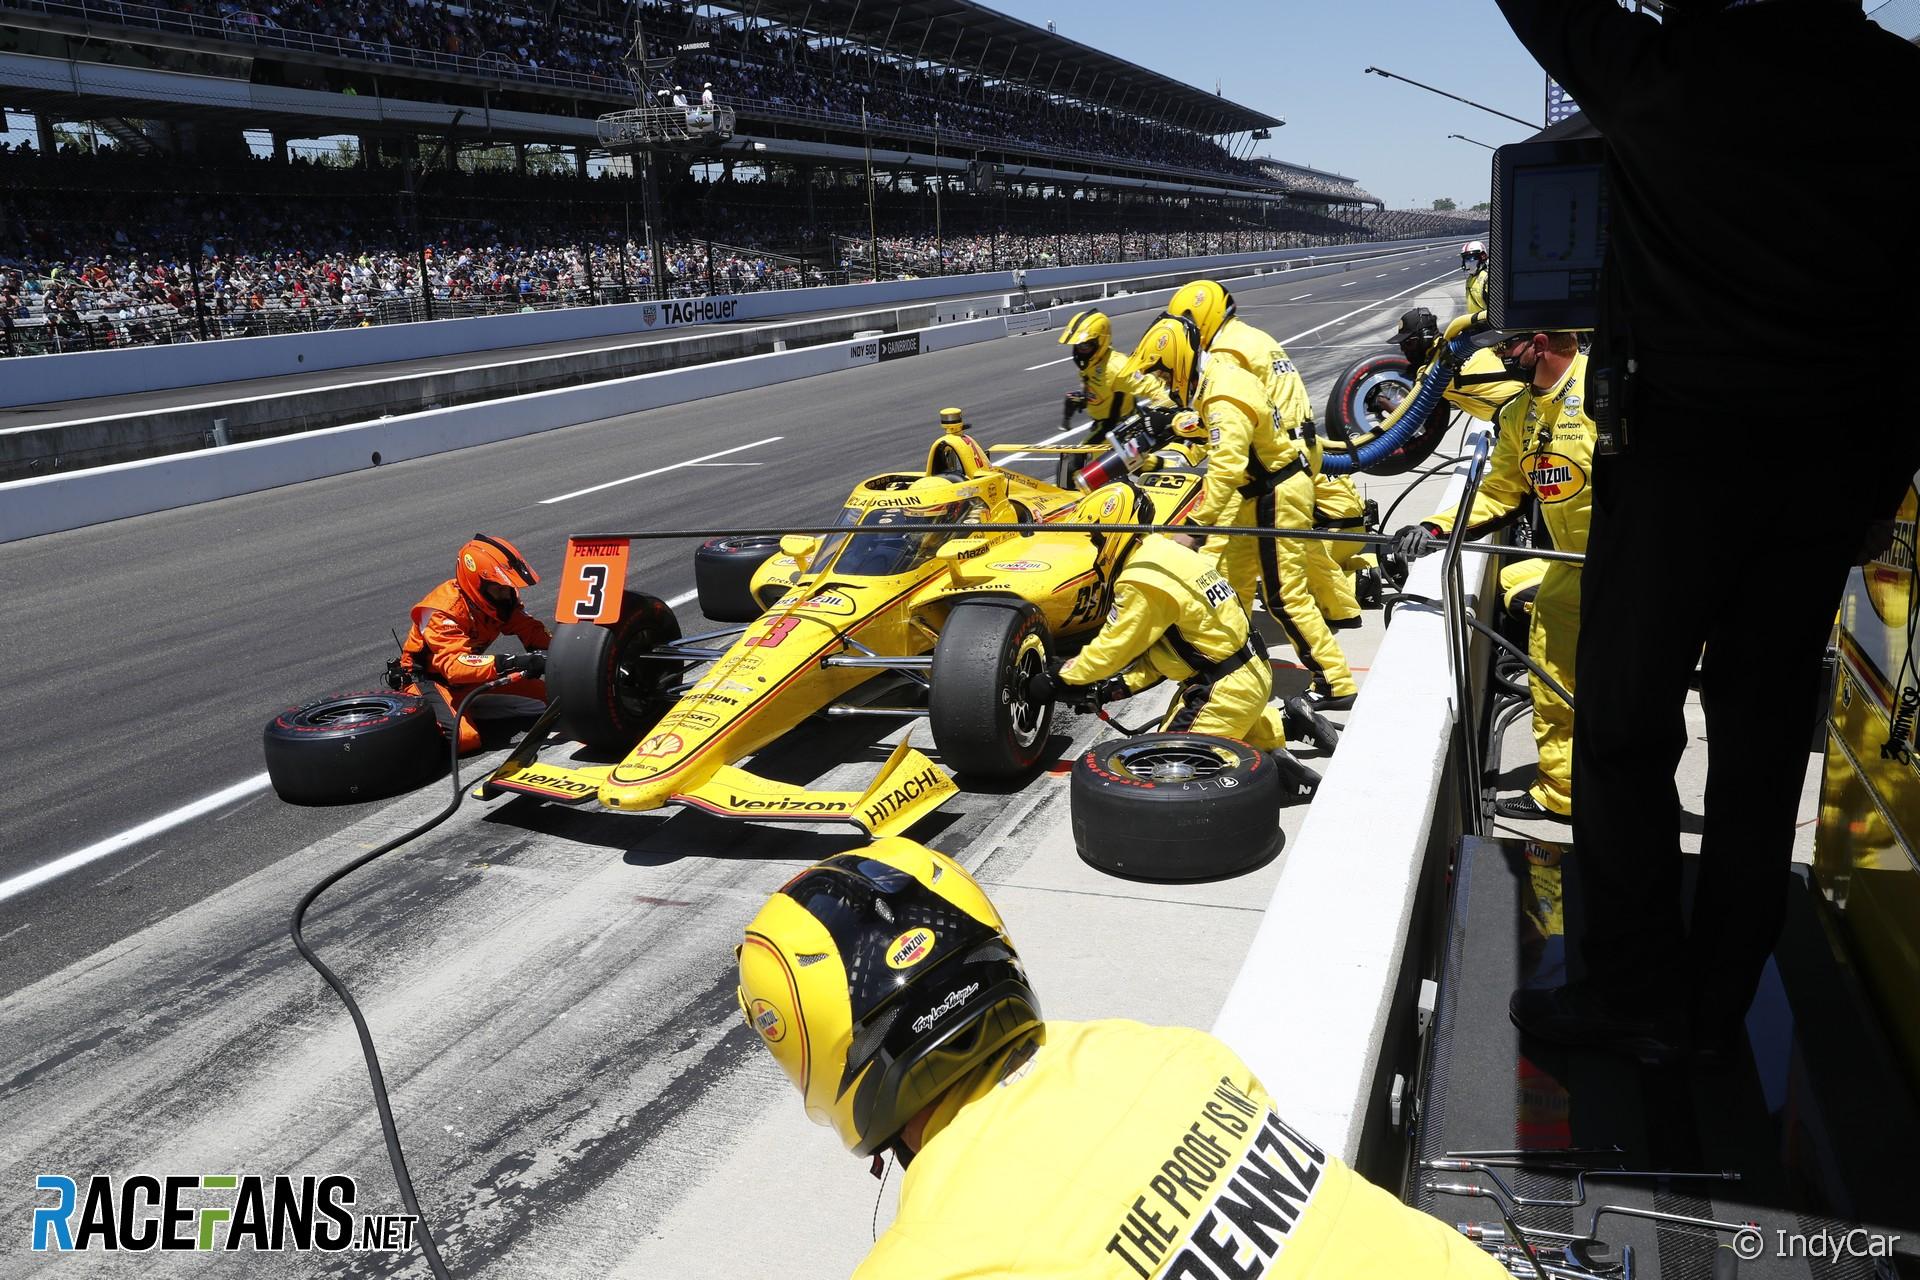 Scott McLaughlin, Penske, IndyCar, Indianapolis 500, 2021